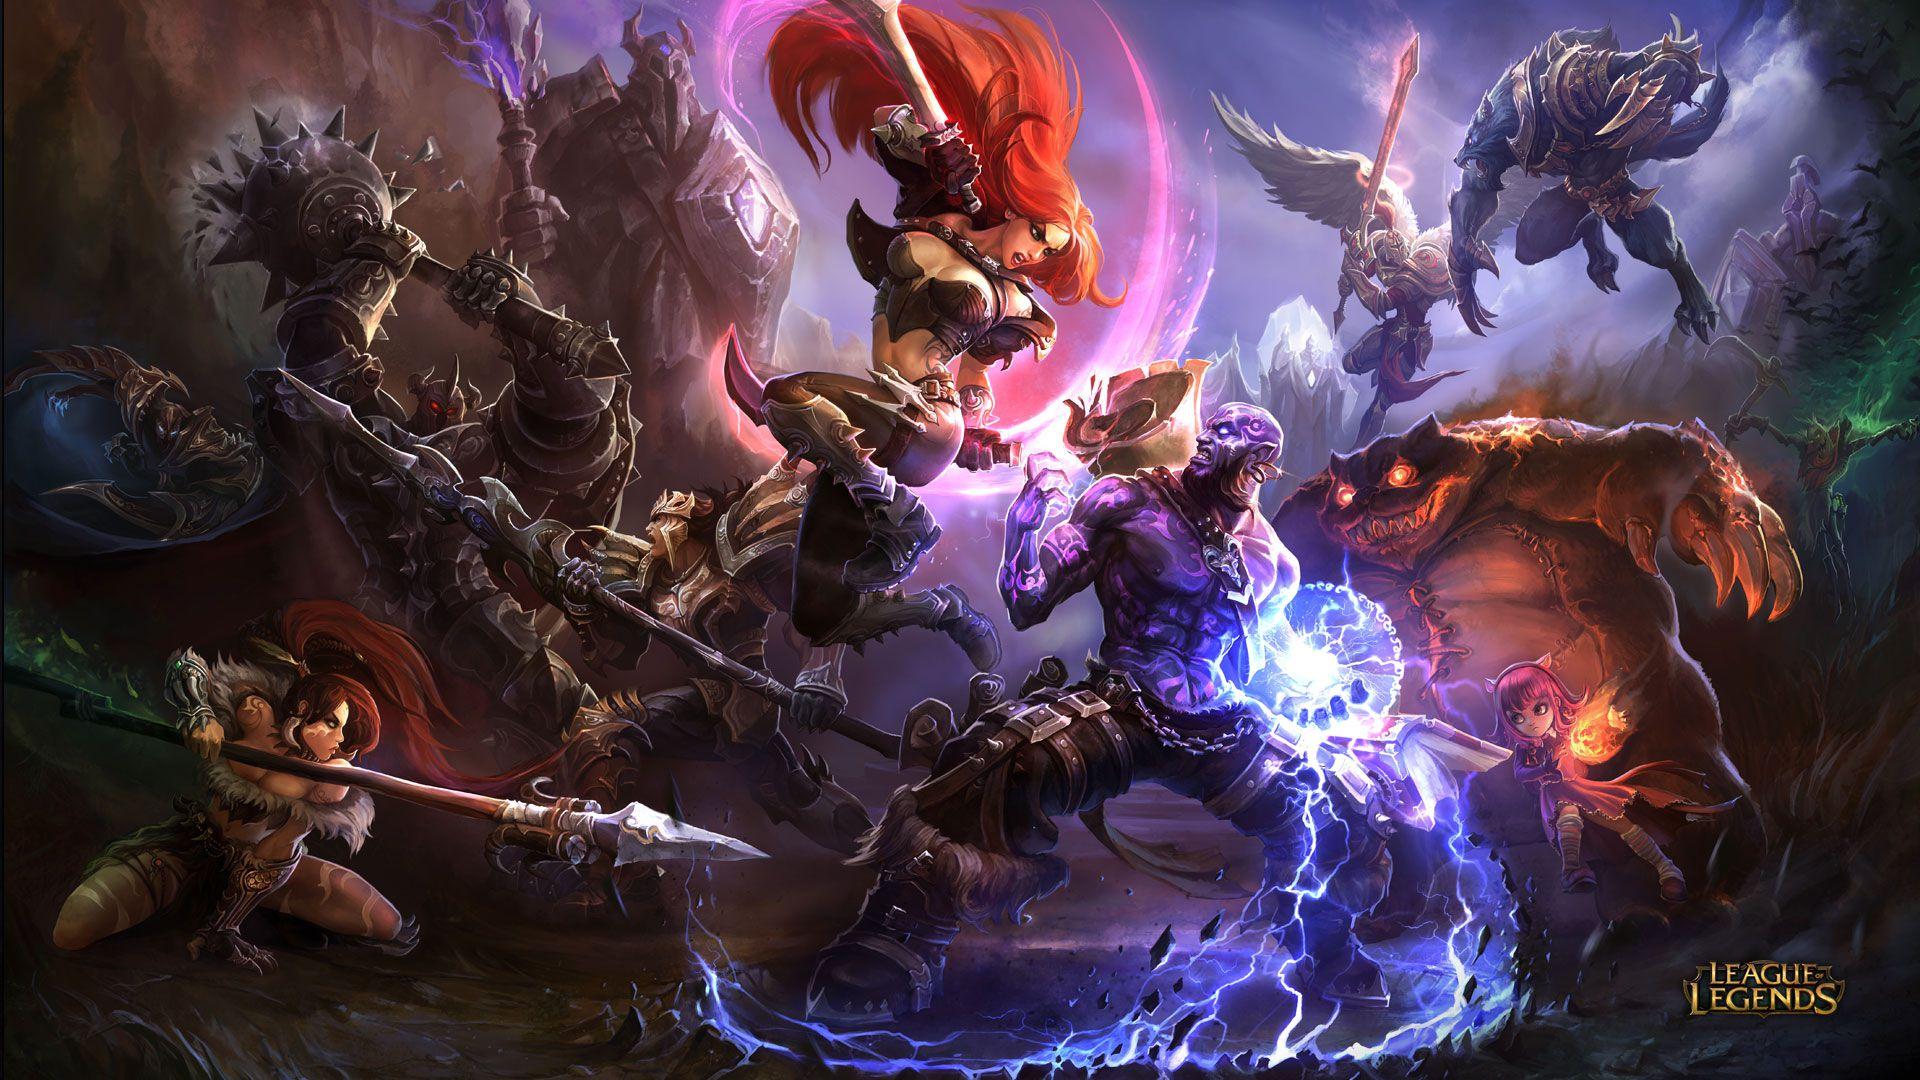 Katarina vs Ryze - League of Legends Wallpapers